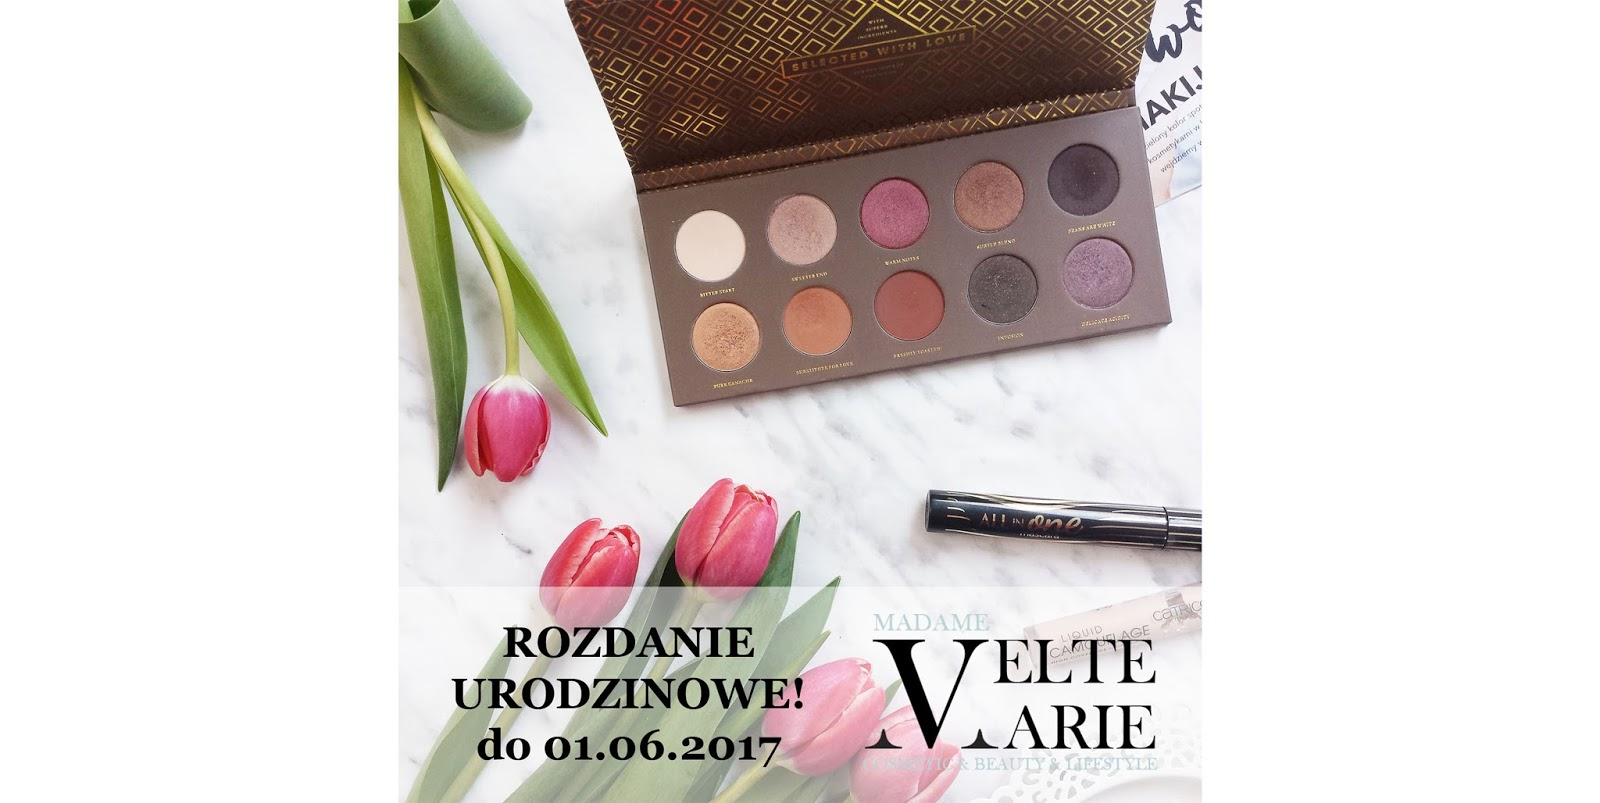 https://marievelte.blogspot.com/2017/05/2-urodziny-bloga-i-niespodzianka.html